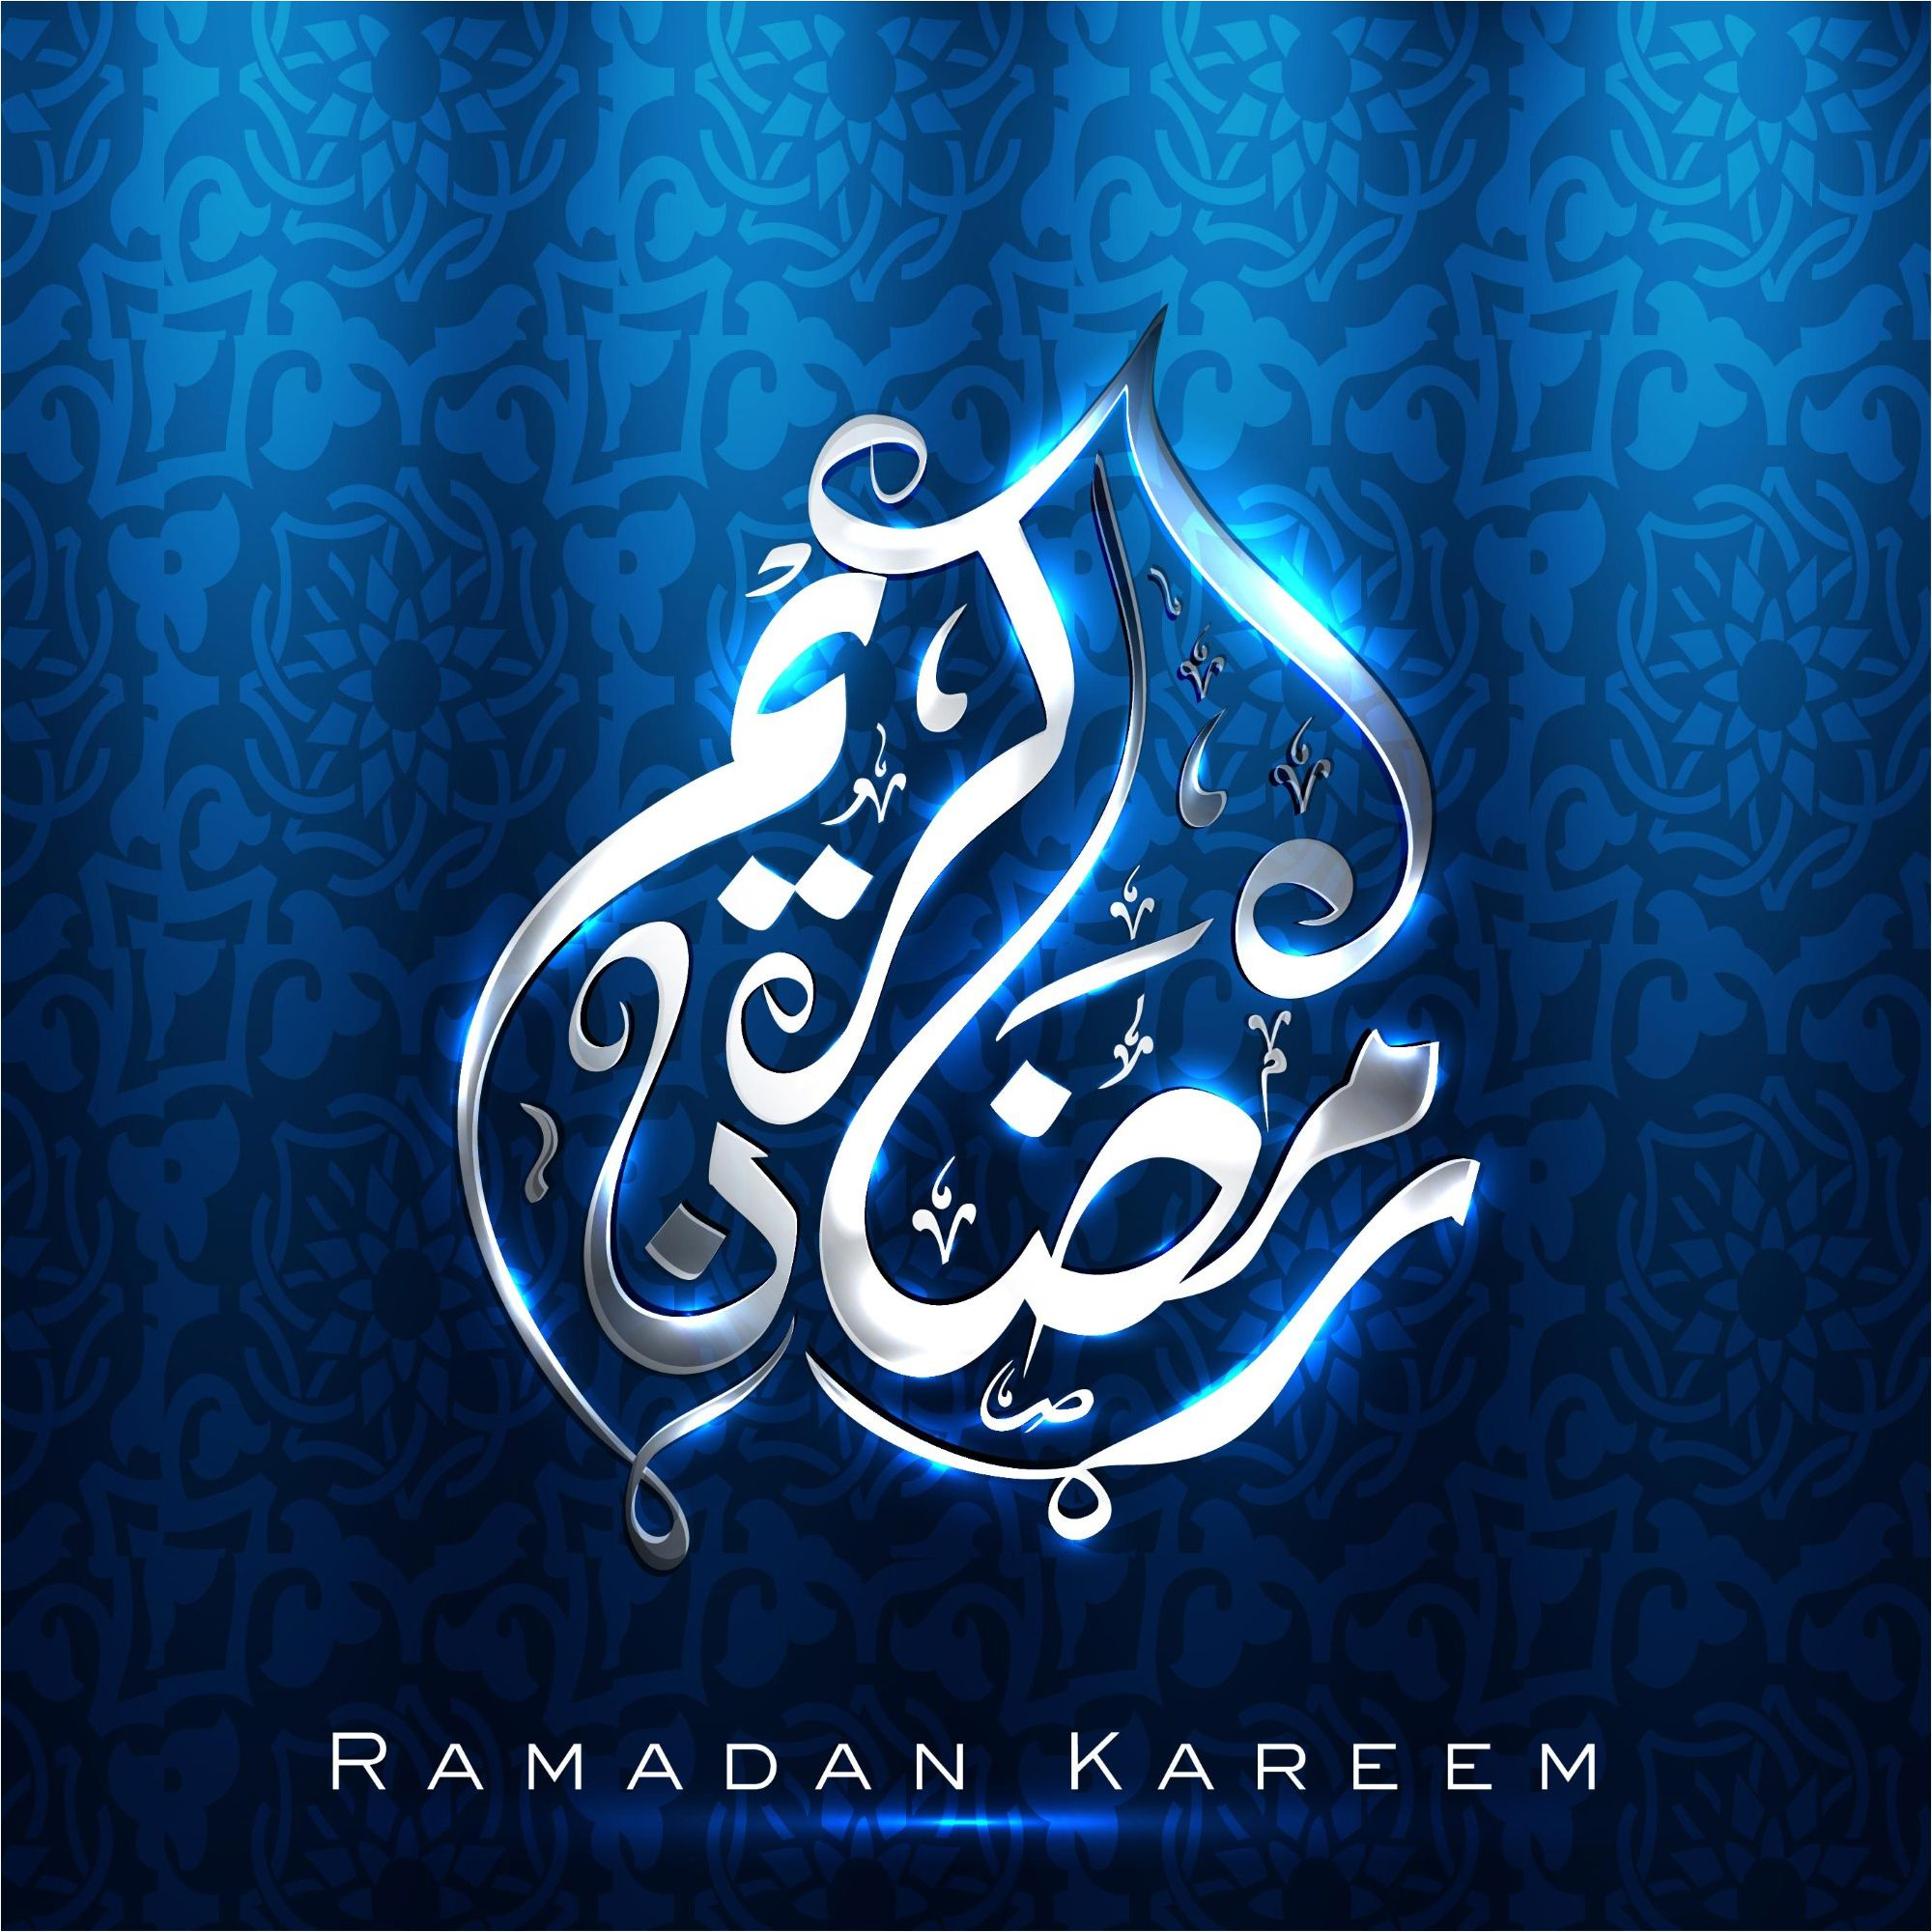 Free vector gray glowing ramadan kareem calligraphy